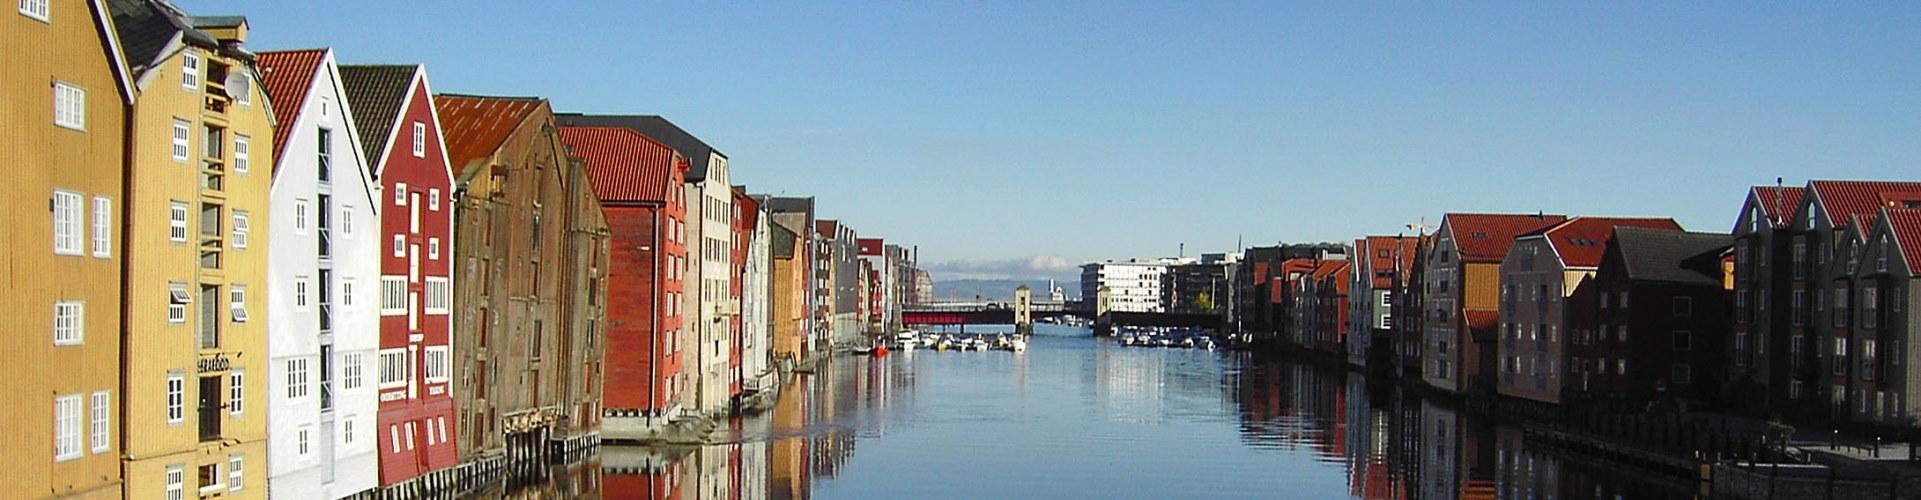 seo Trondheim